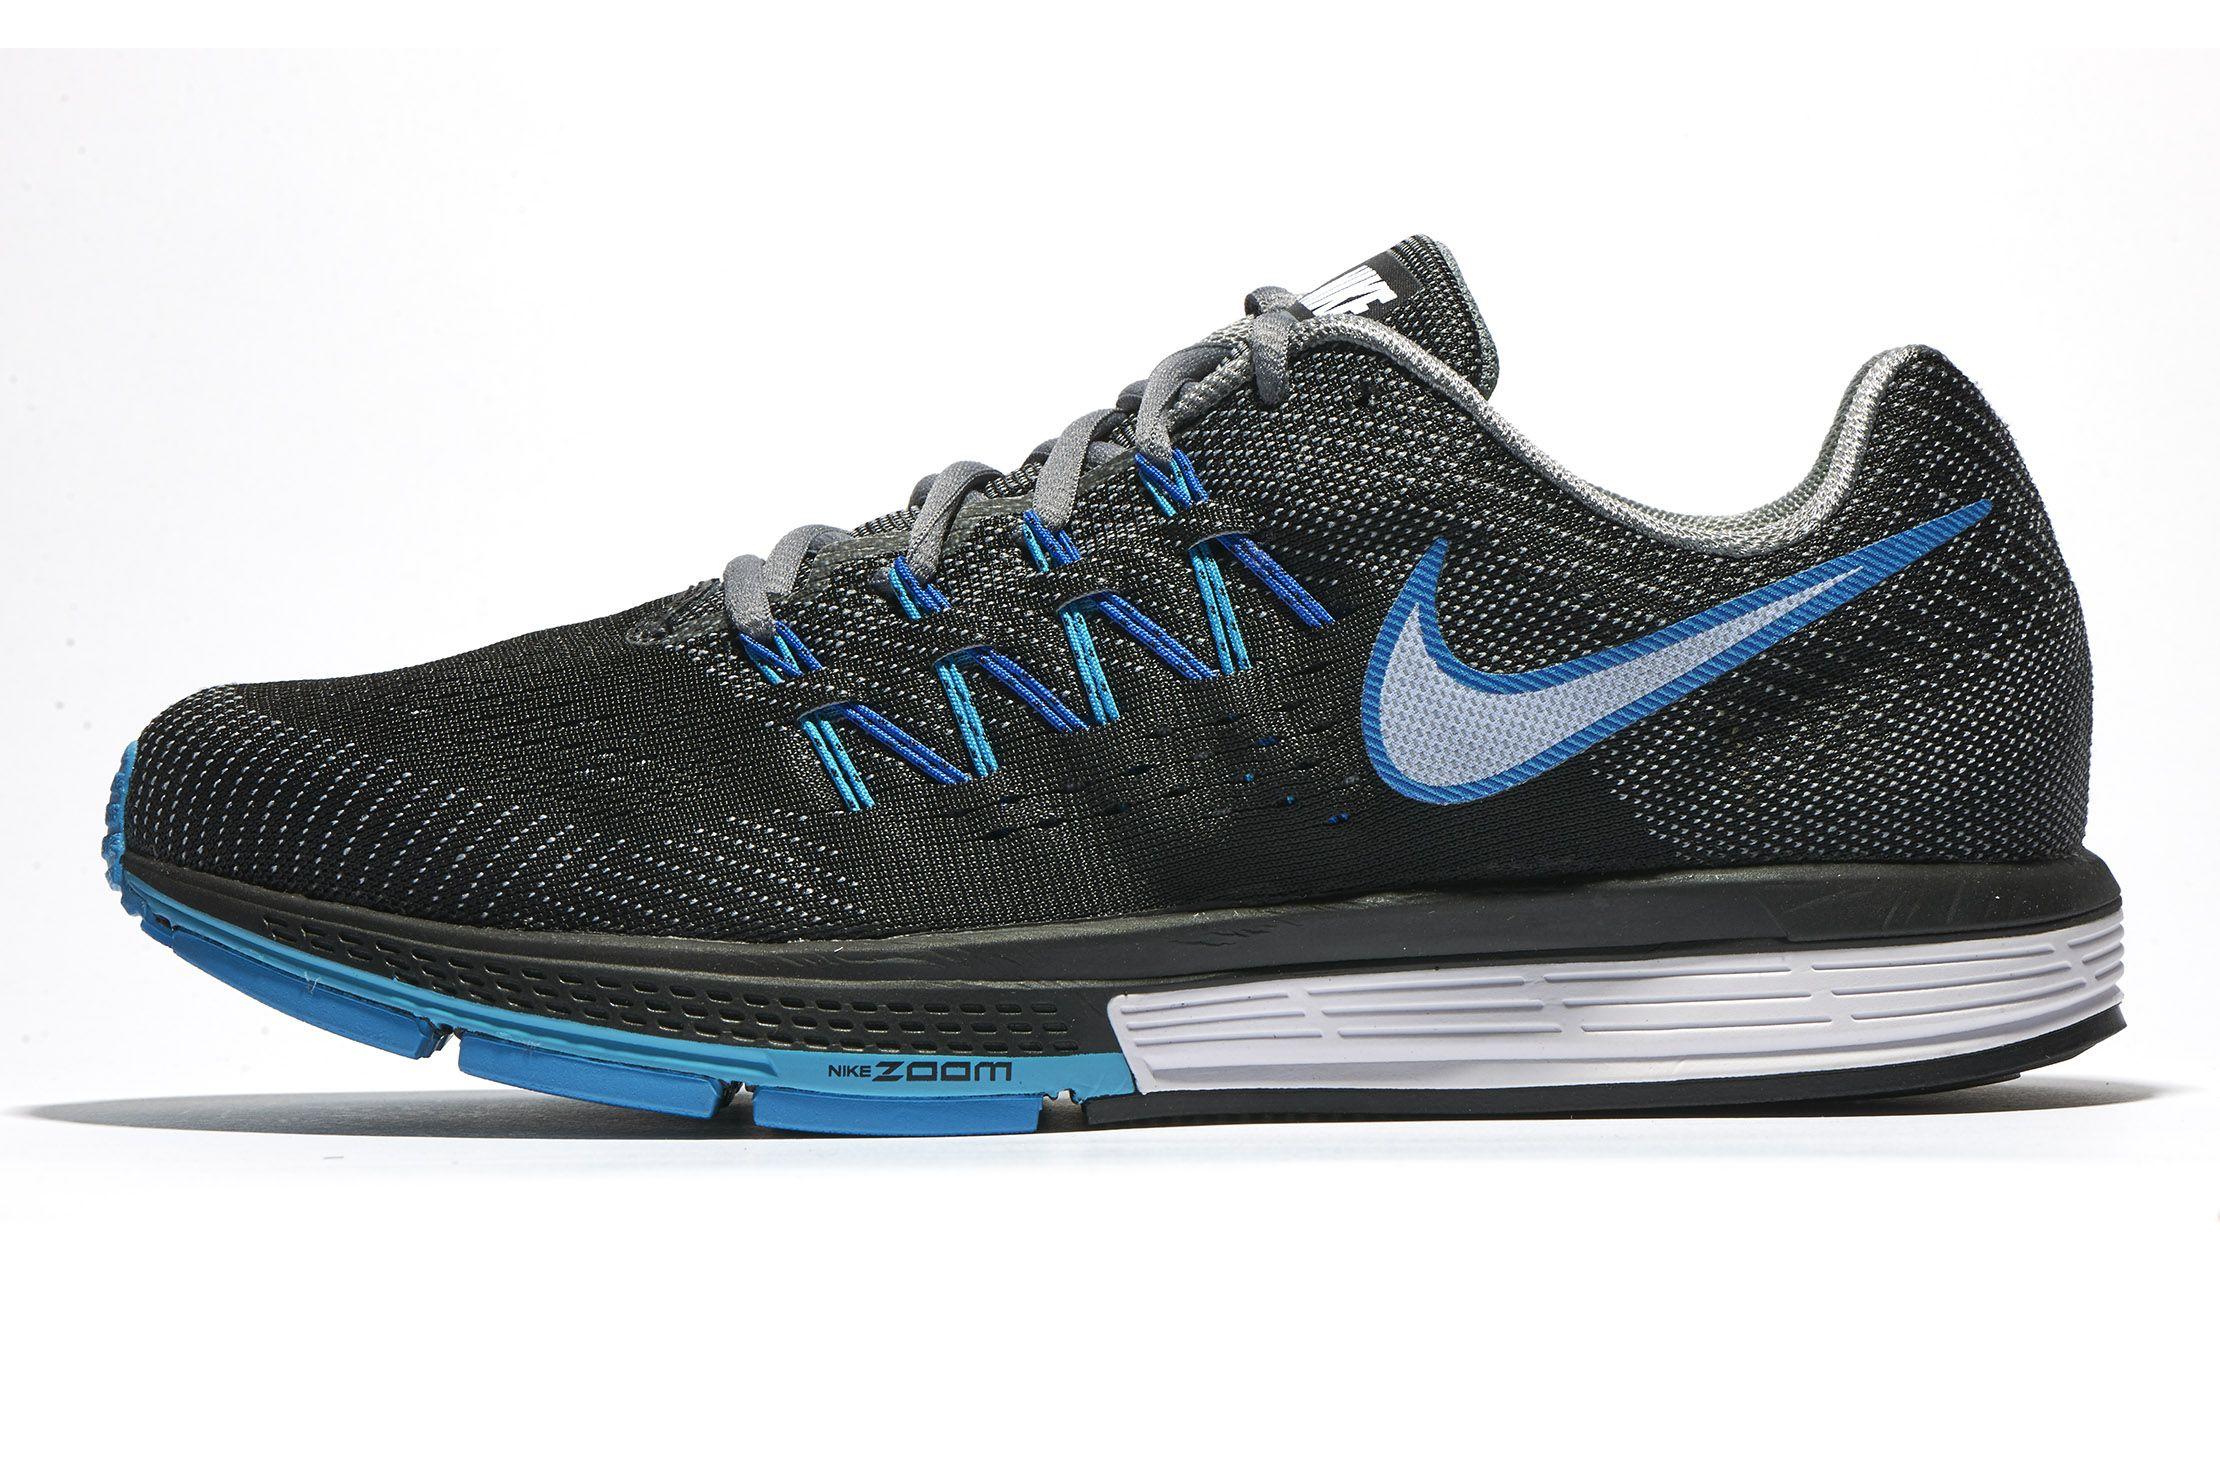 2a3d734cbad Runner s World 2015 Fall Shoe Guide